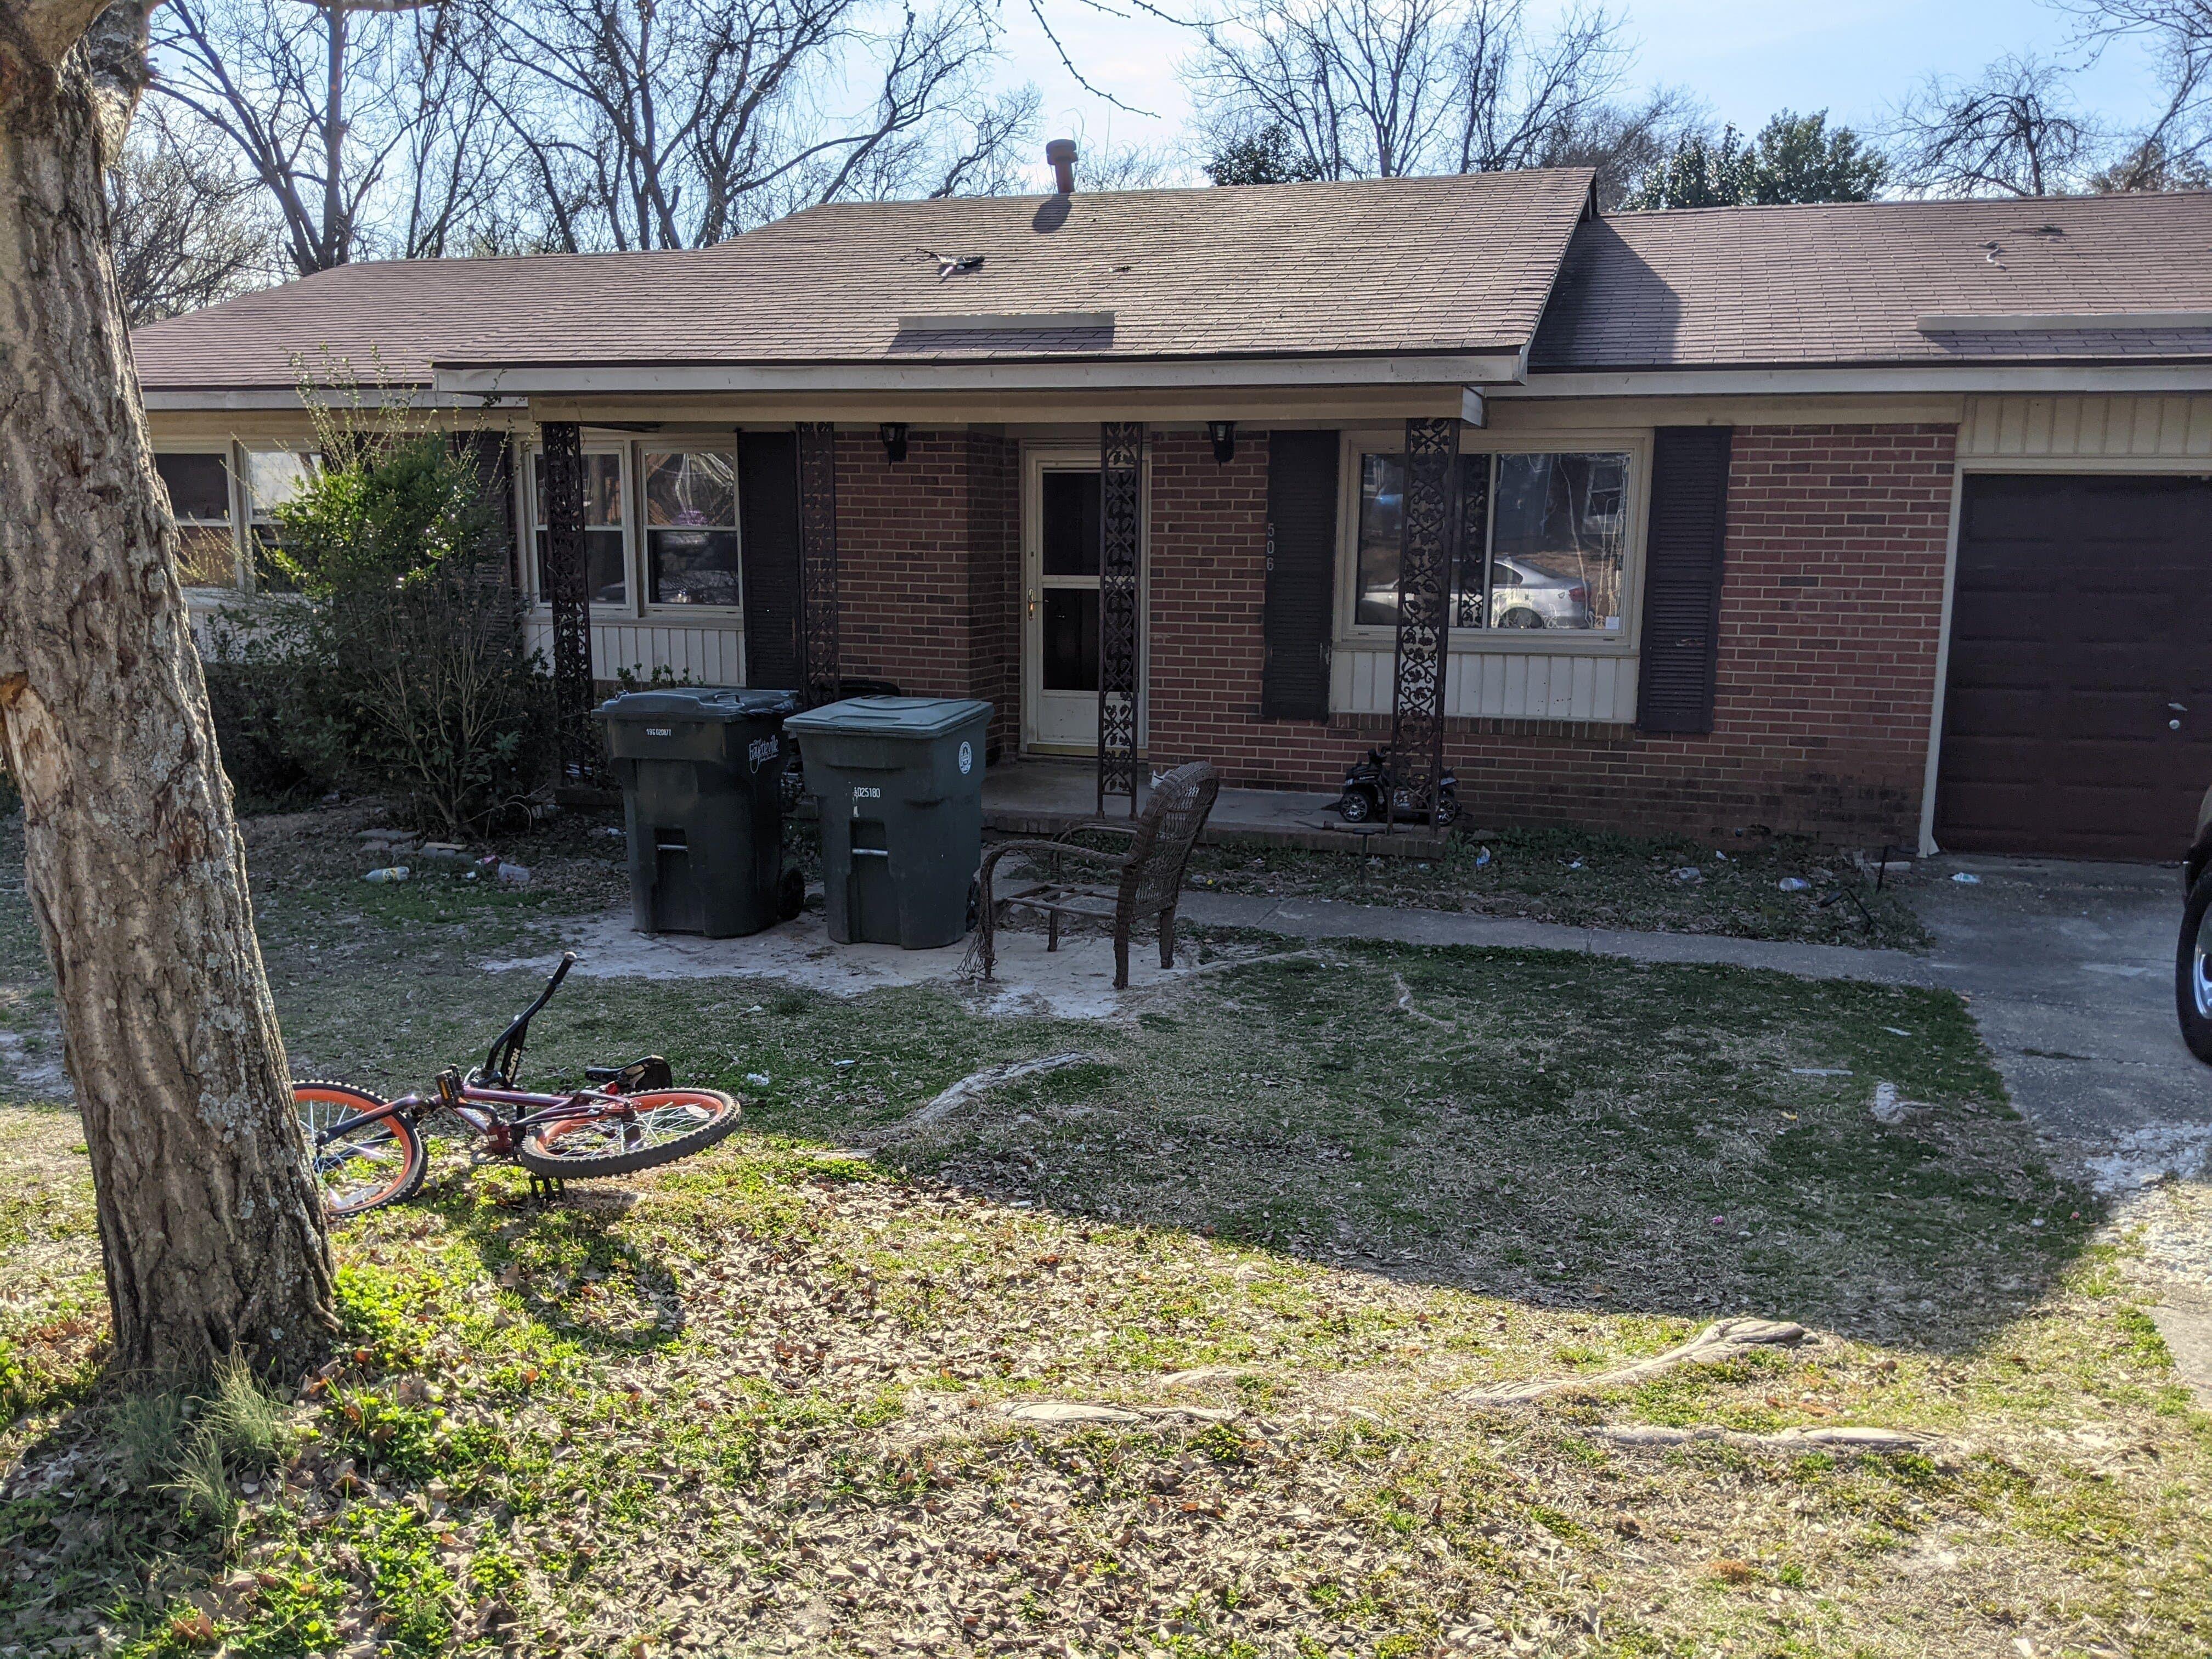 506 Alleghany Rd, Fayetteville, NC